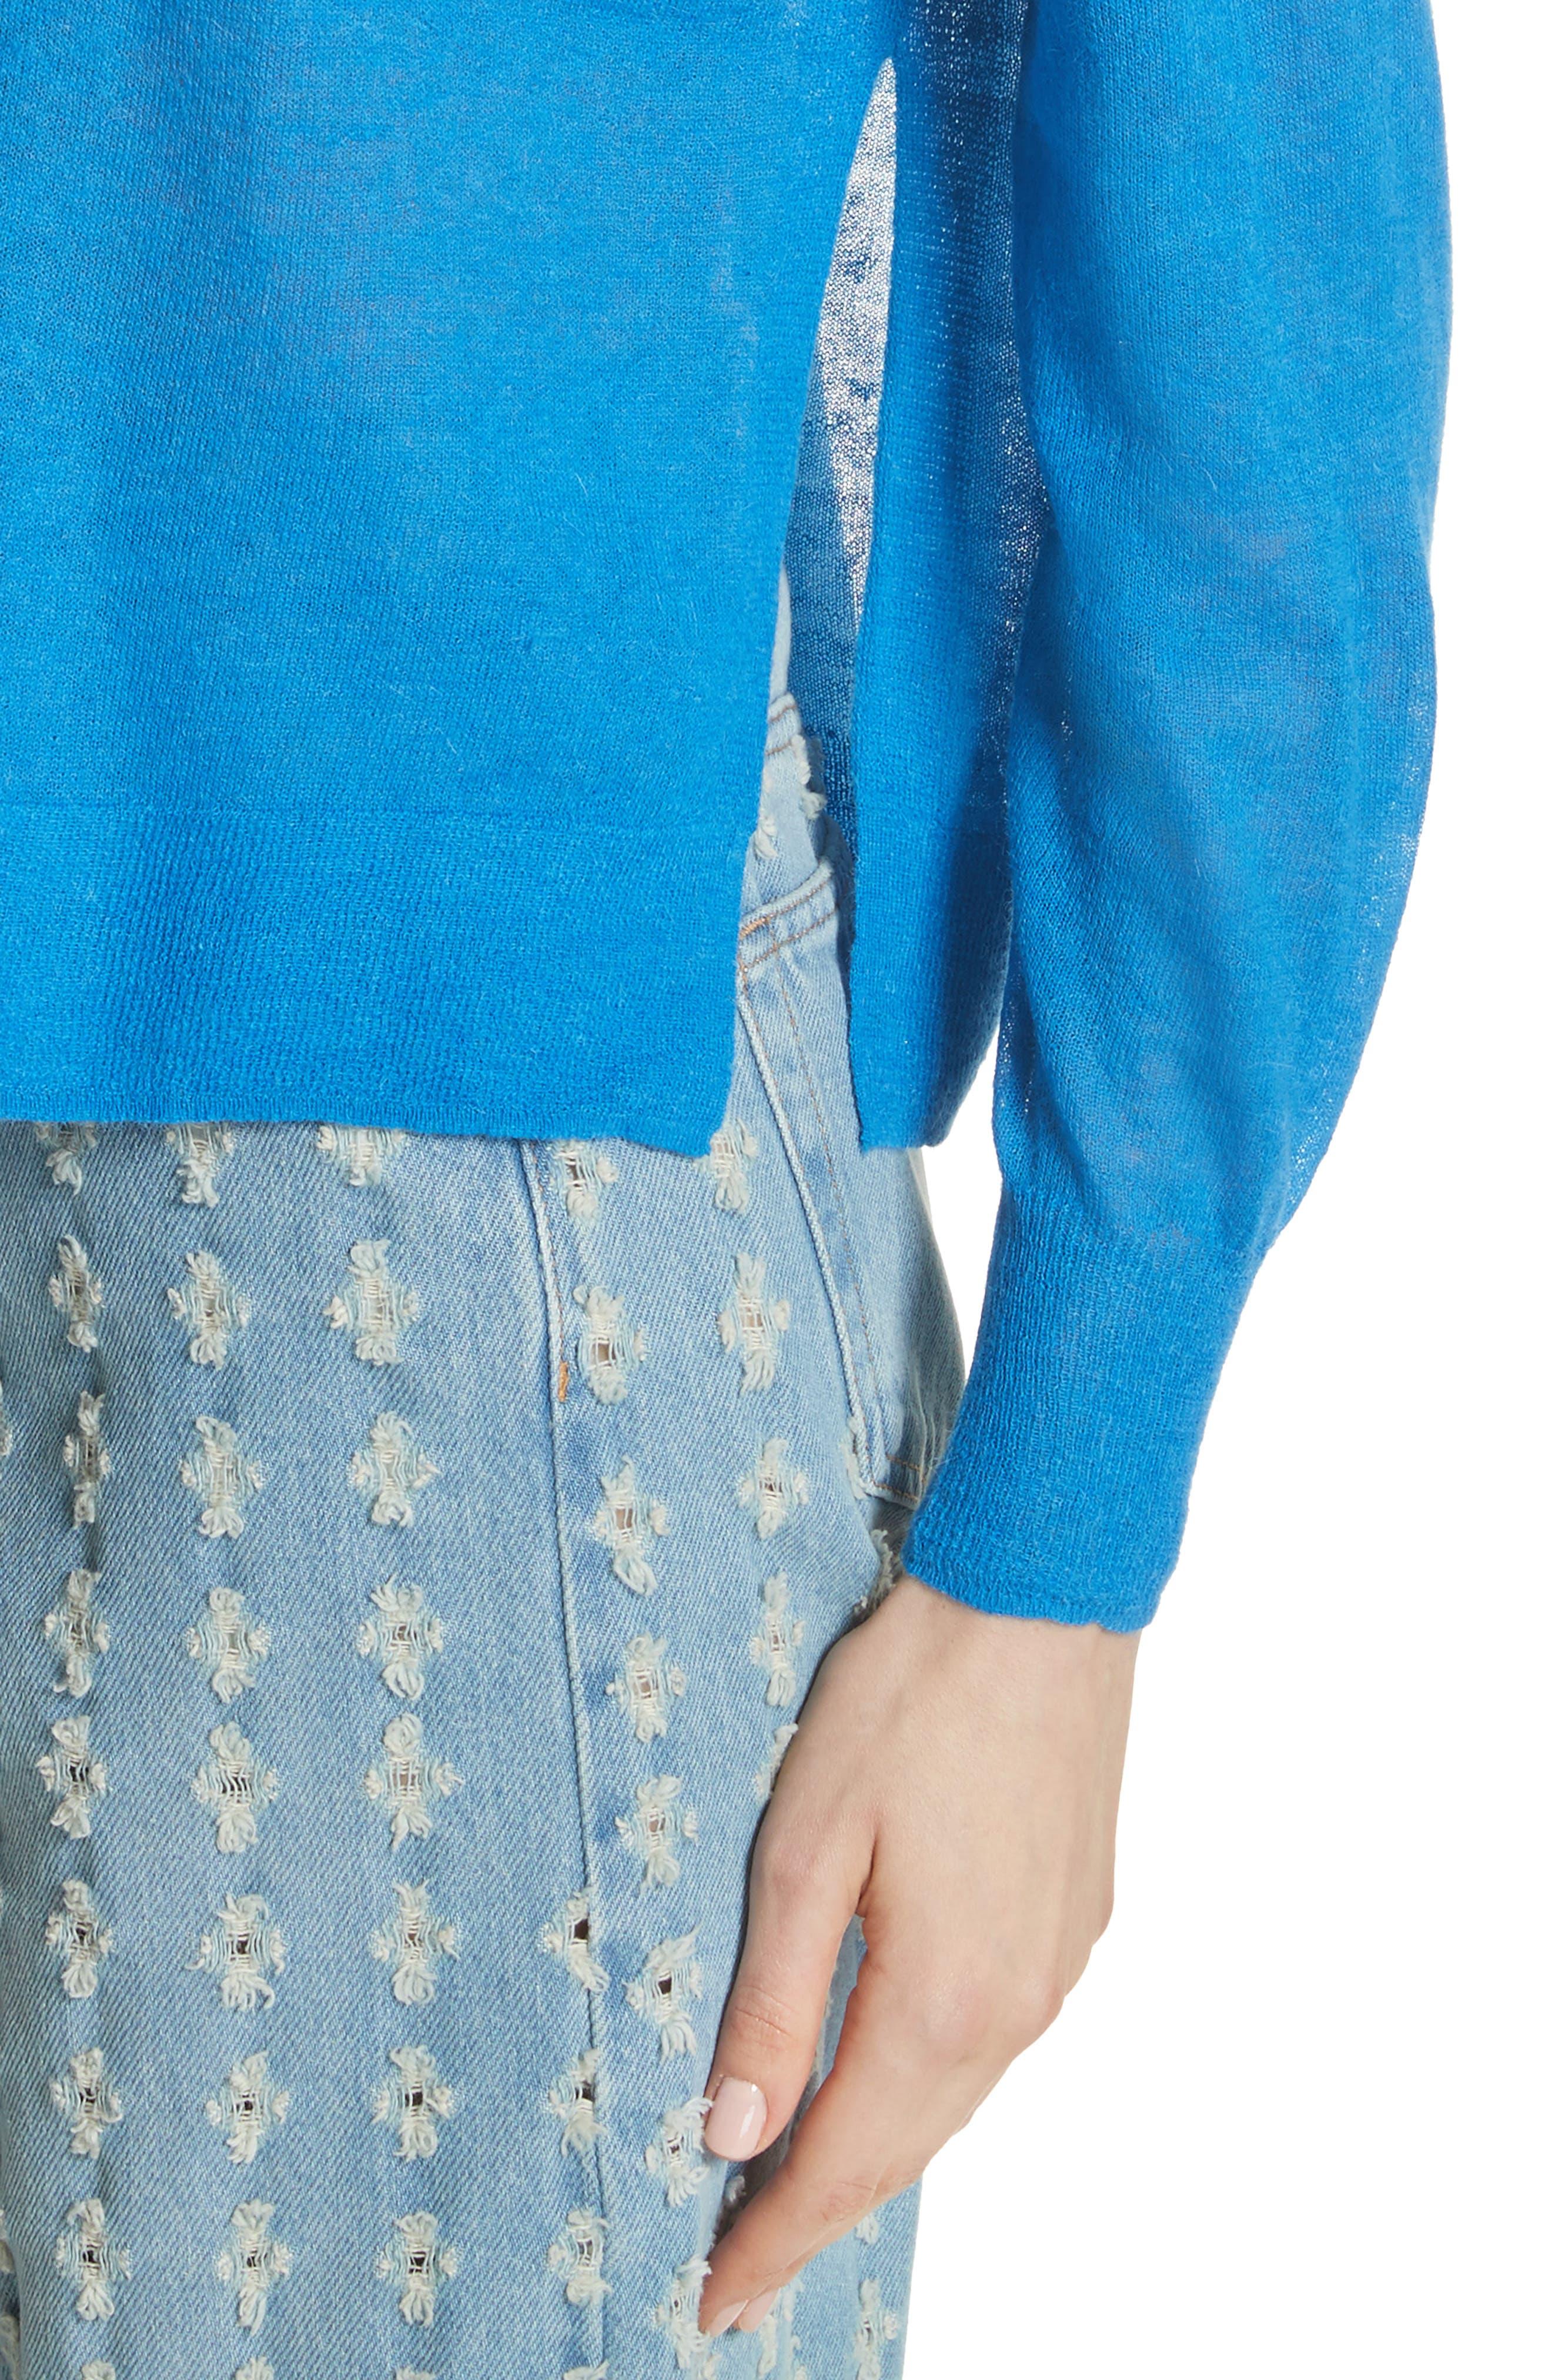 Isabel Marant Étoile Wool & Alpaca Blend Sweater,                             Alternate thumbnail 4, color,